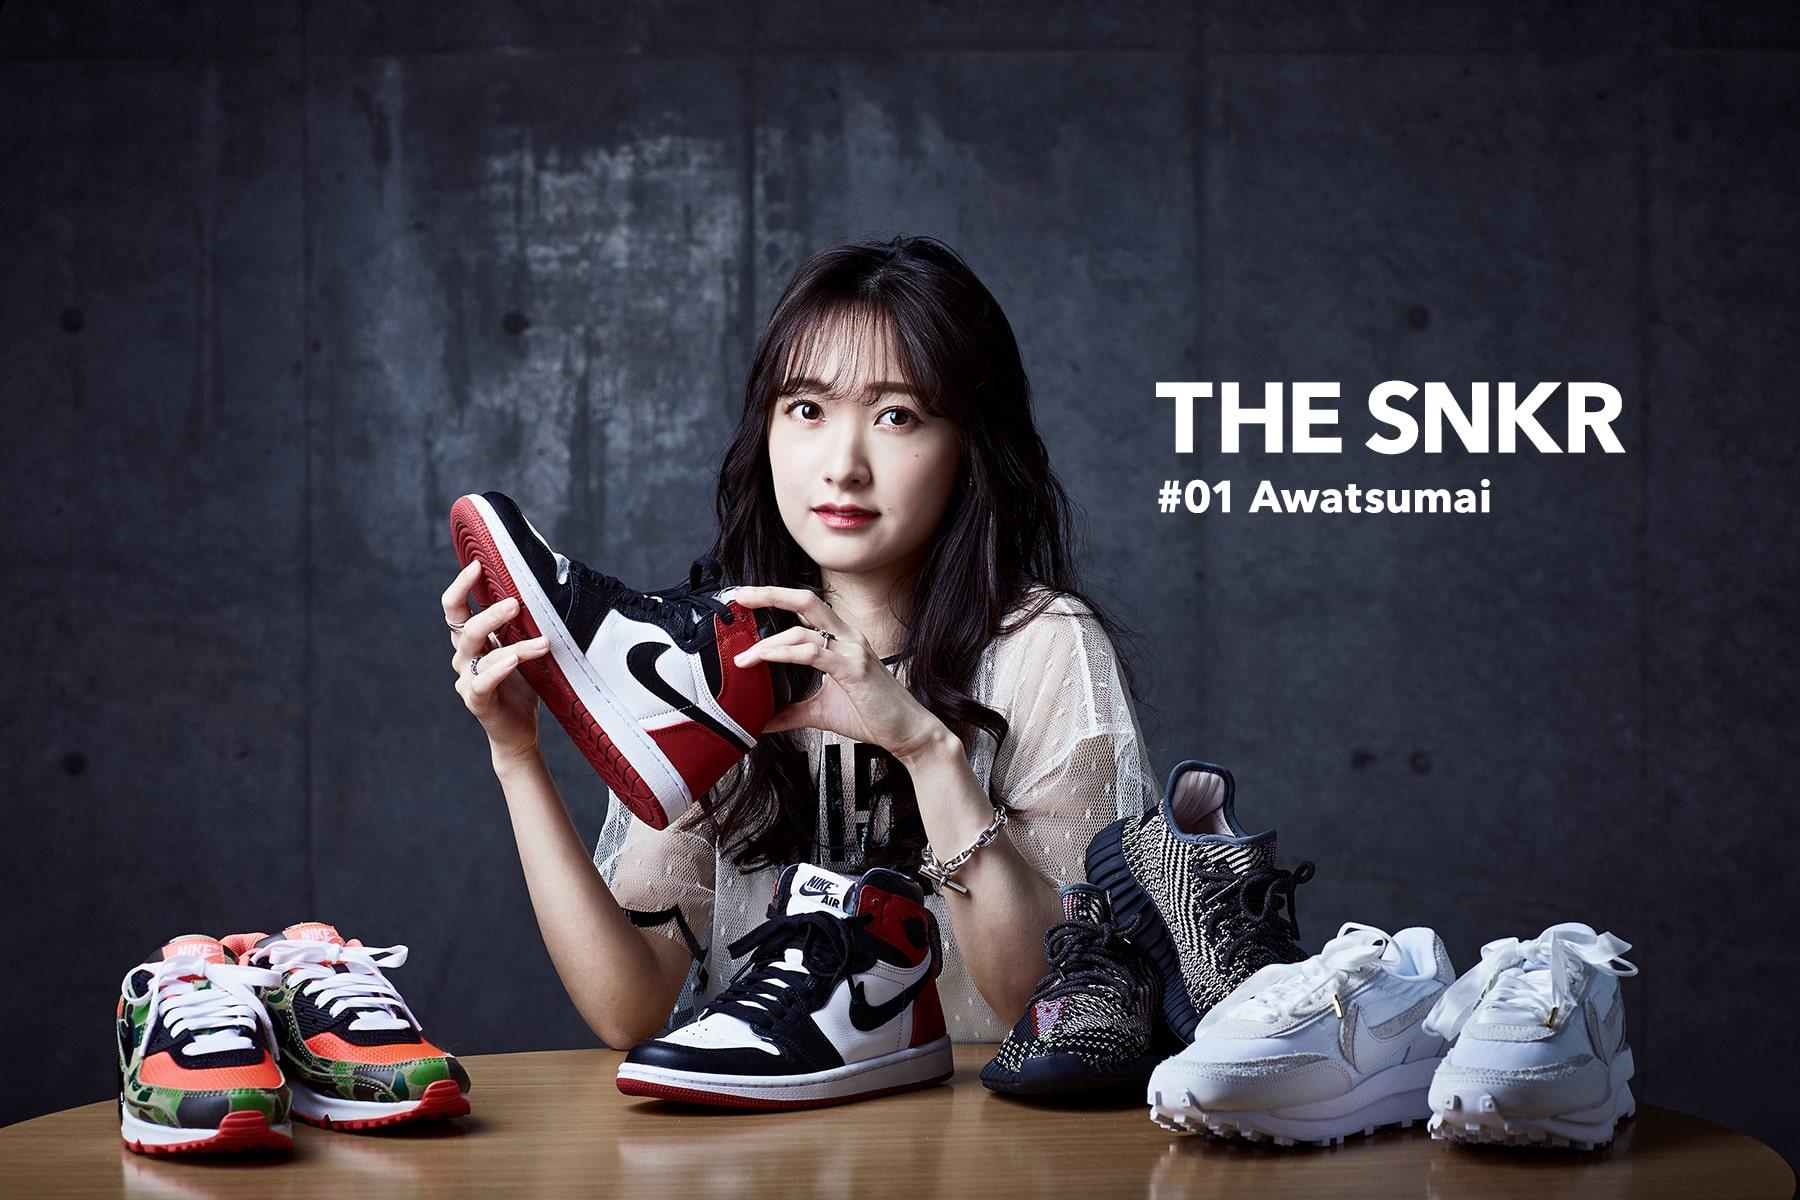 THE SNKR #01 あわつまい